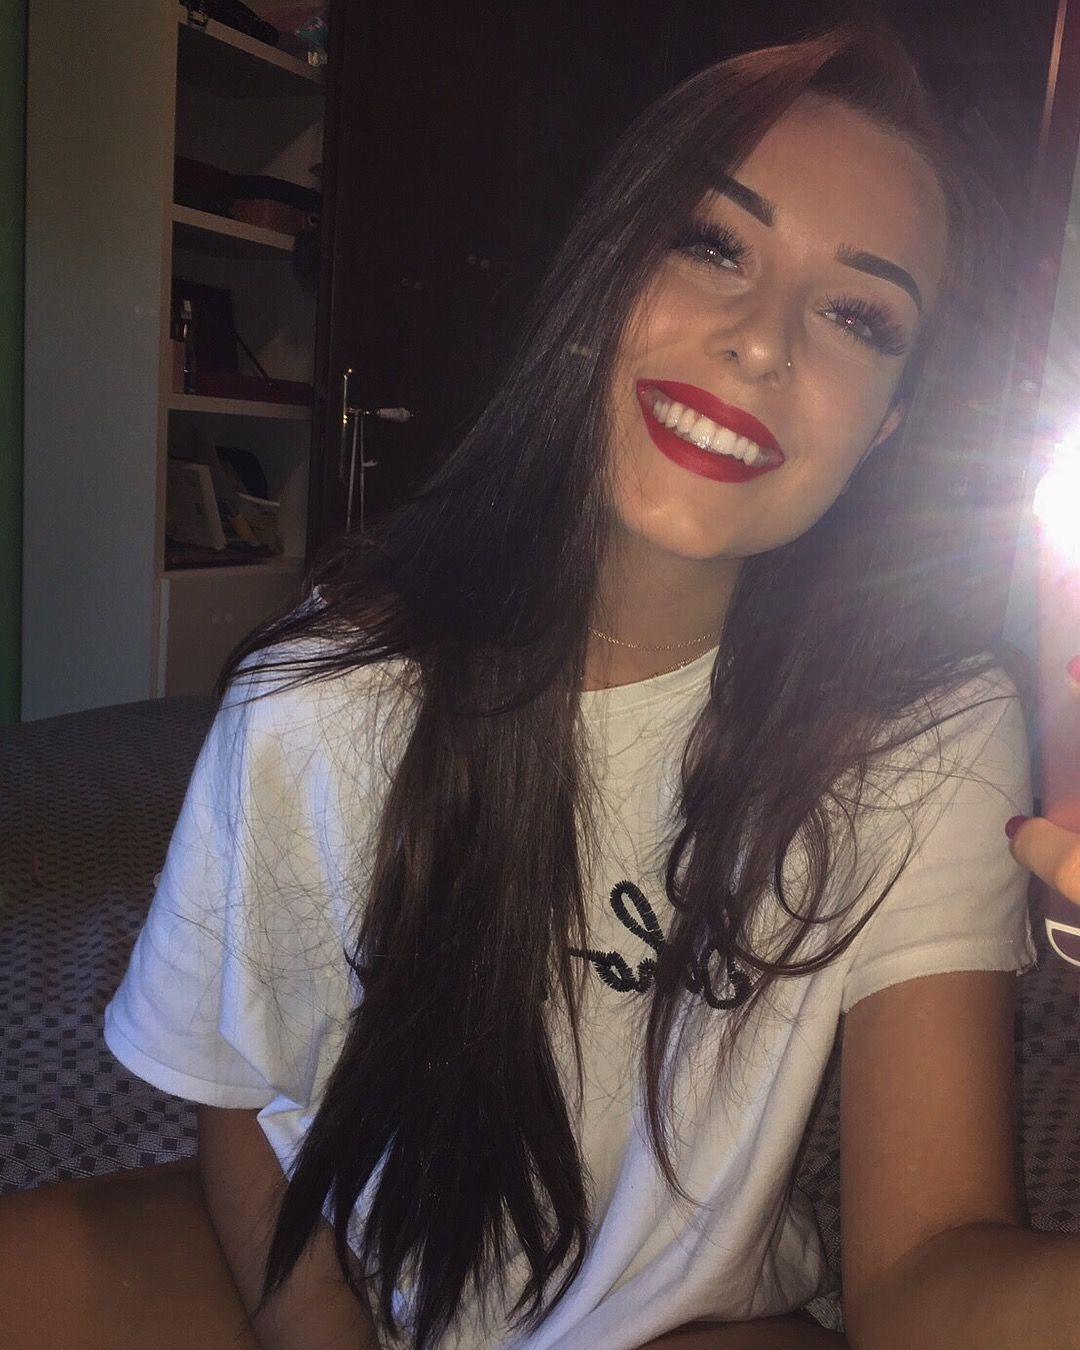 Smile. White Teeth. Red Lips. Long Hair. Brunette. Fashion